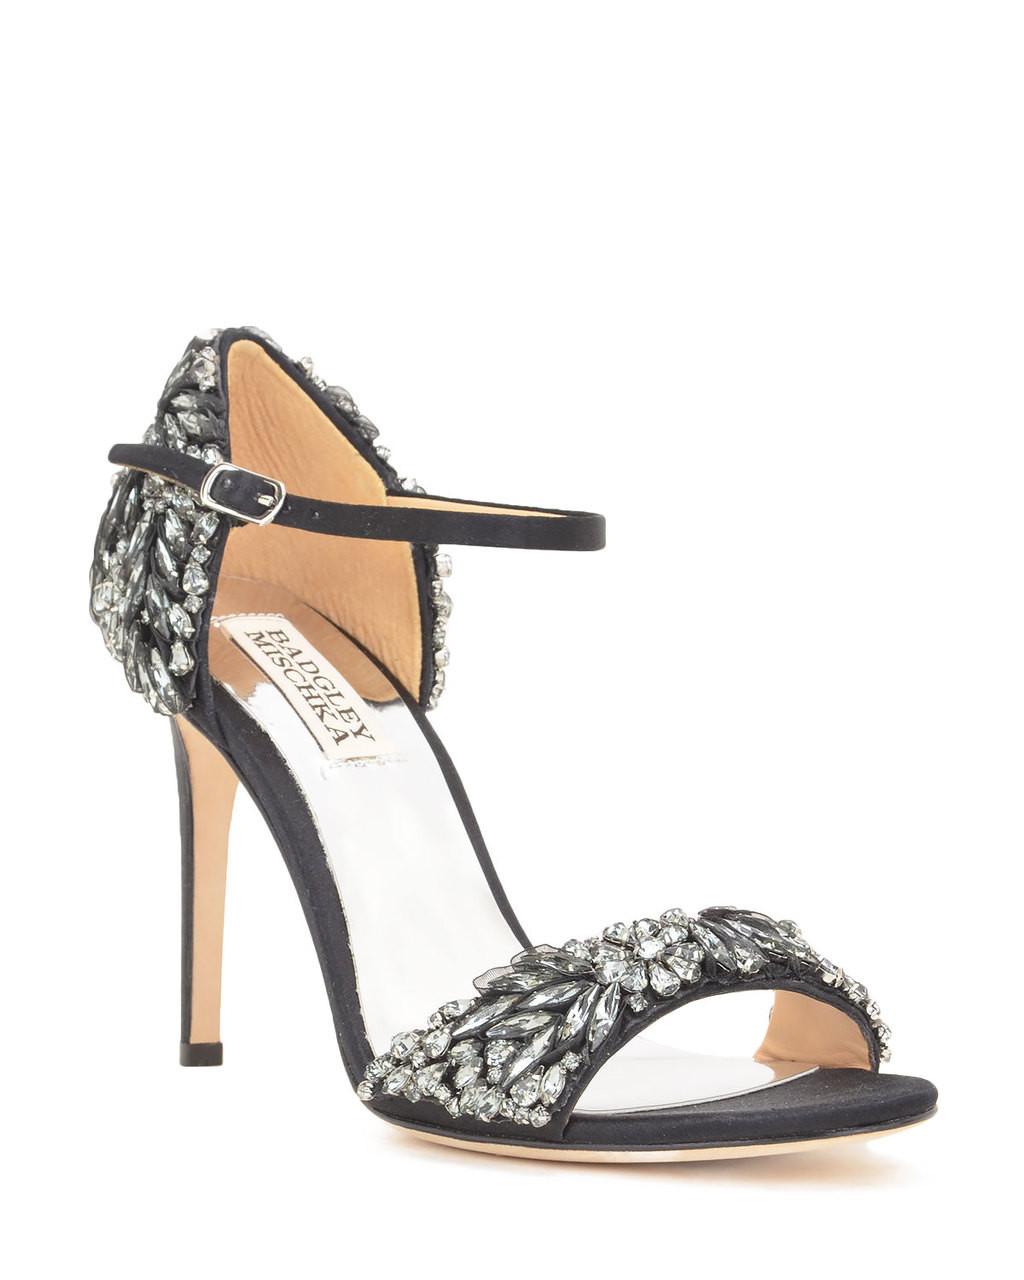 Tampa Embellished Heel Evening Shoe By Badgley Mischka